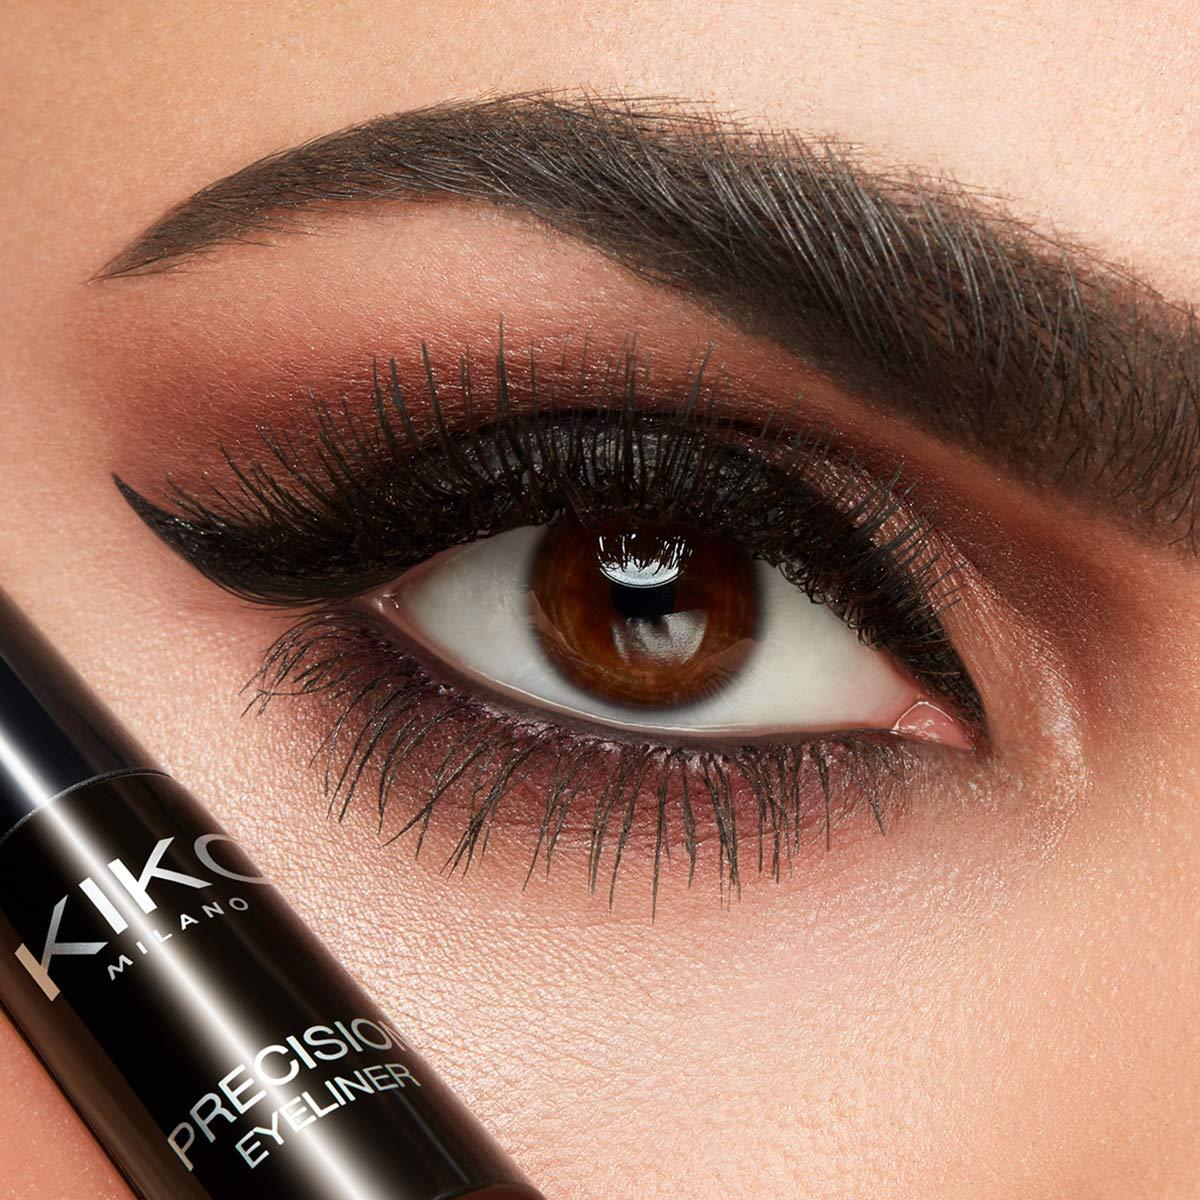 KIKO MILANO - Precision Eyeliner | Easy to Use Liquid Eyeliner with Fine Brush Applicator | Long Lasting Eyeliner Black | Cruelty Free | Made in Italy by Kiko